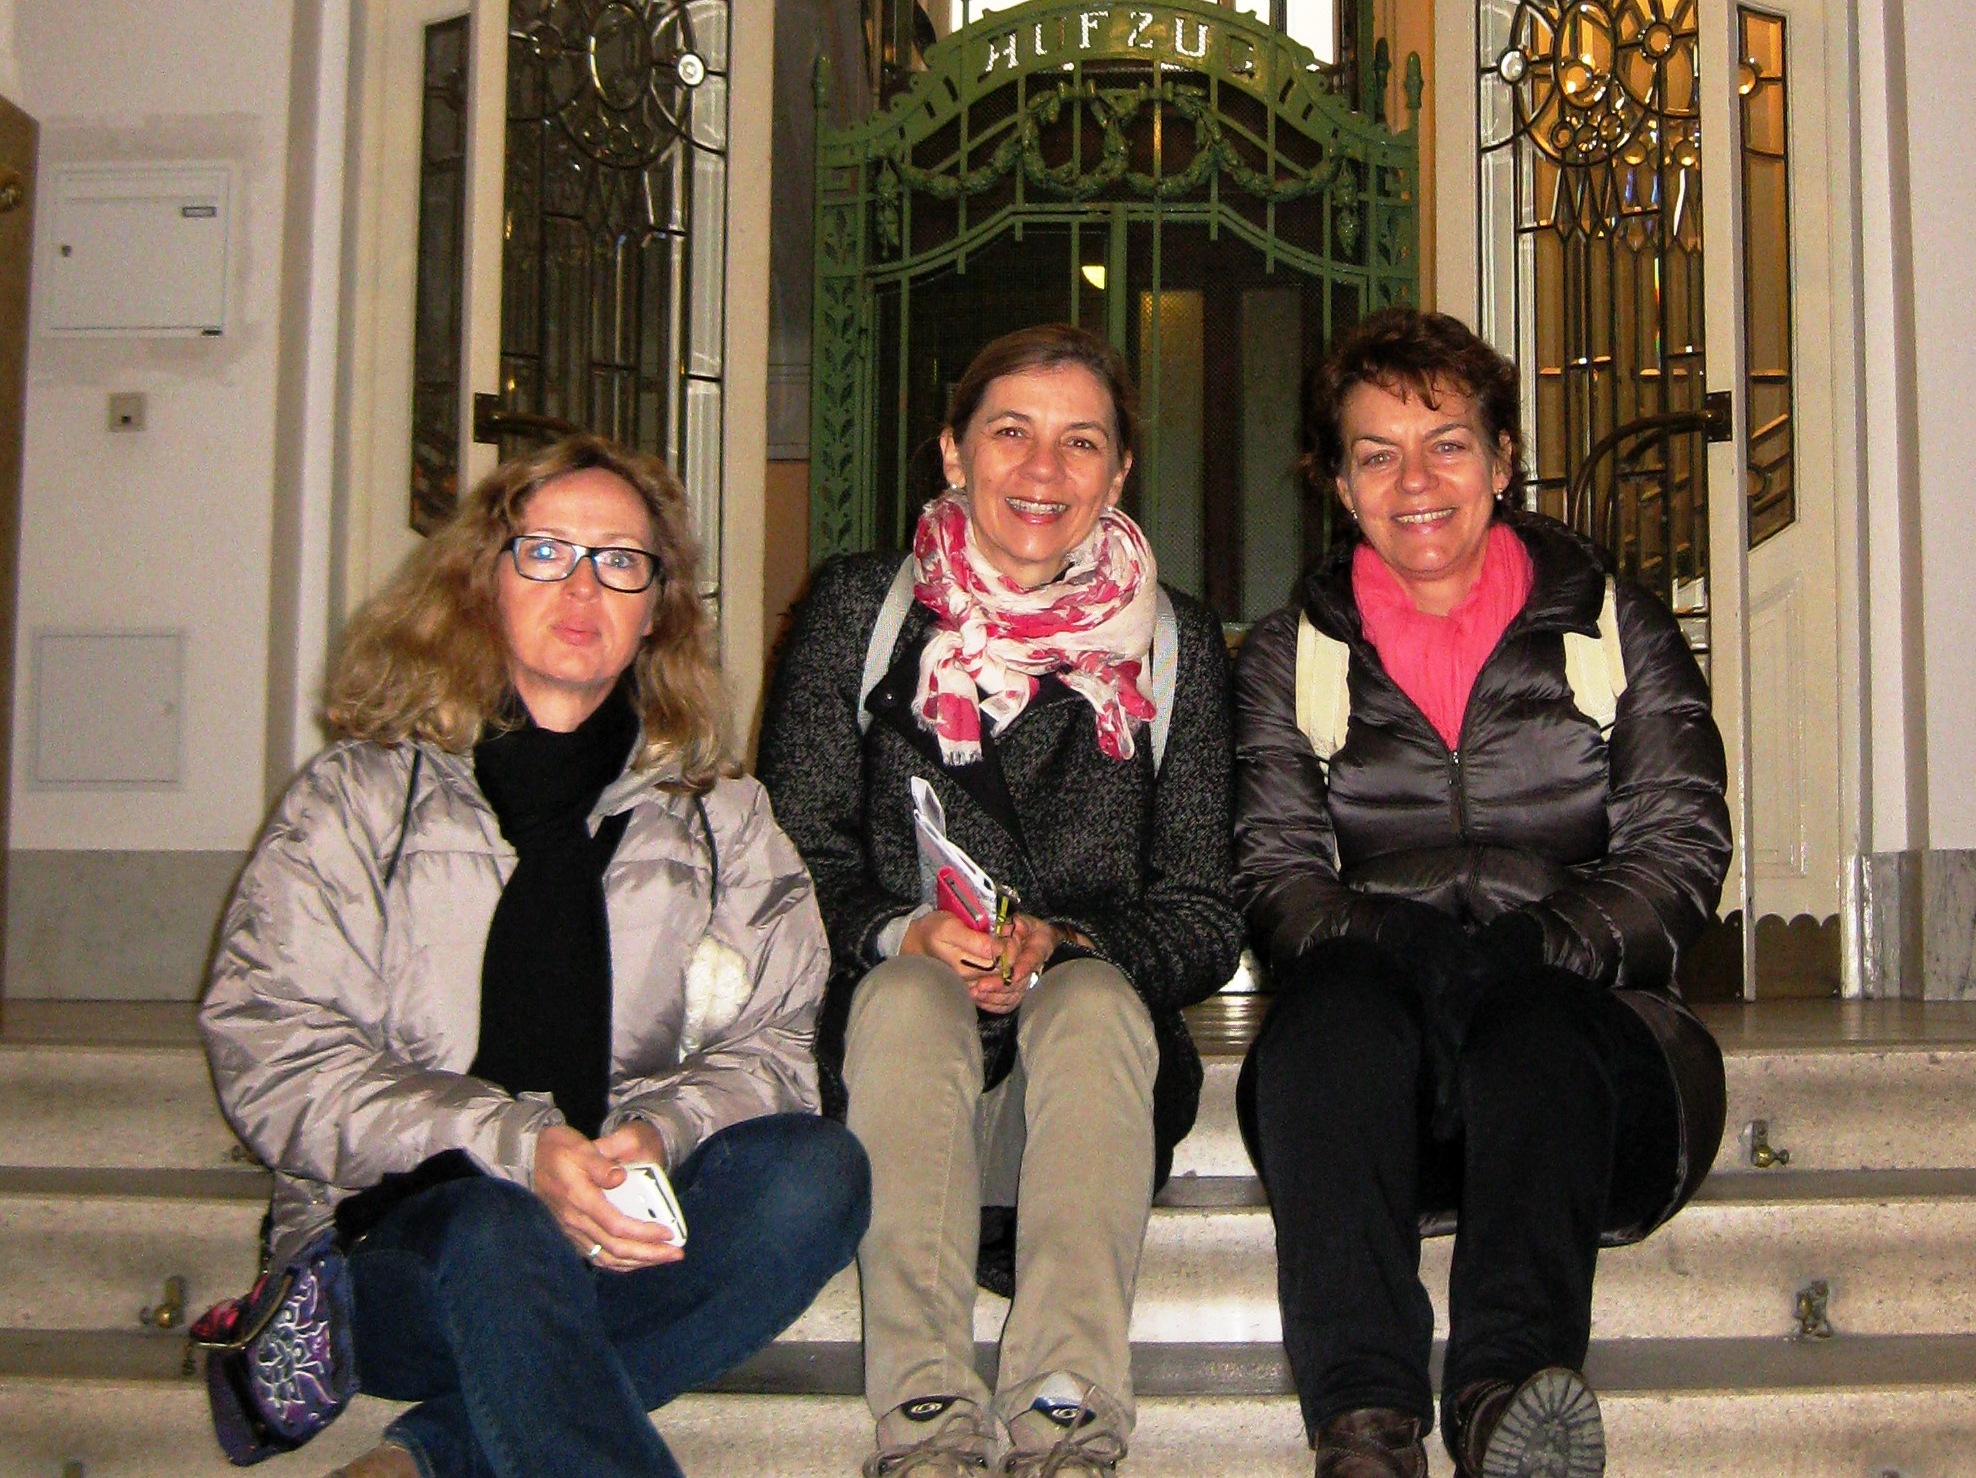 Taking a break on a walk through the city of Vienna